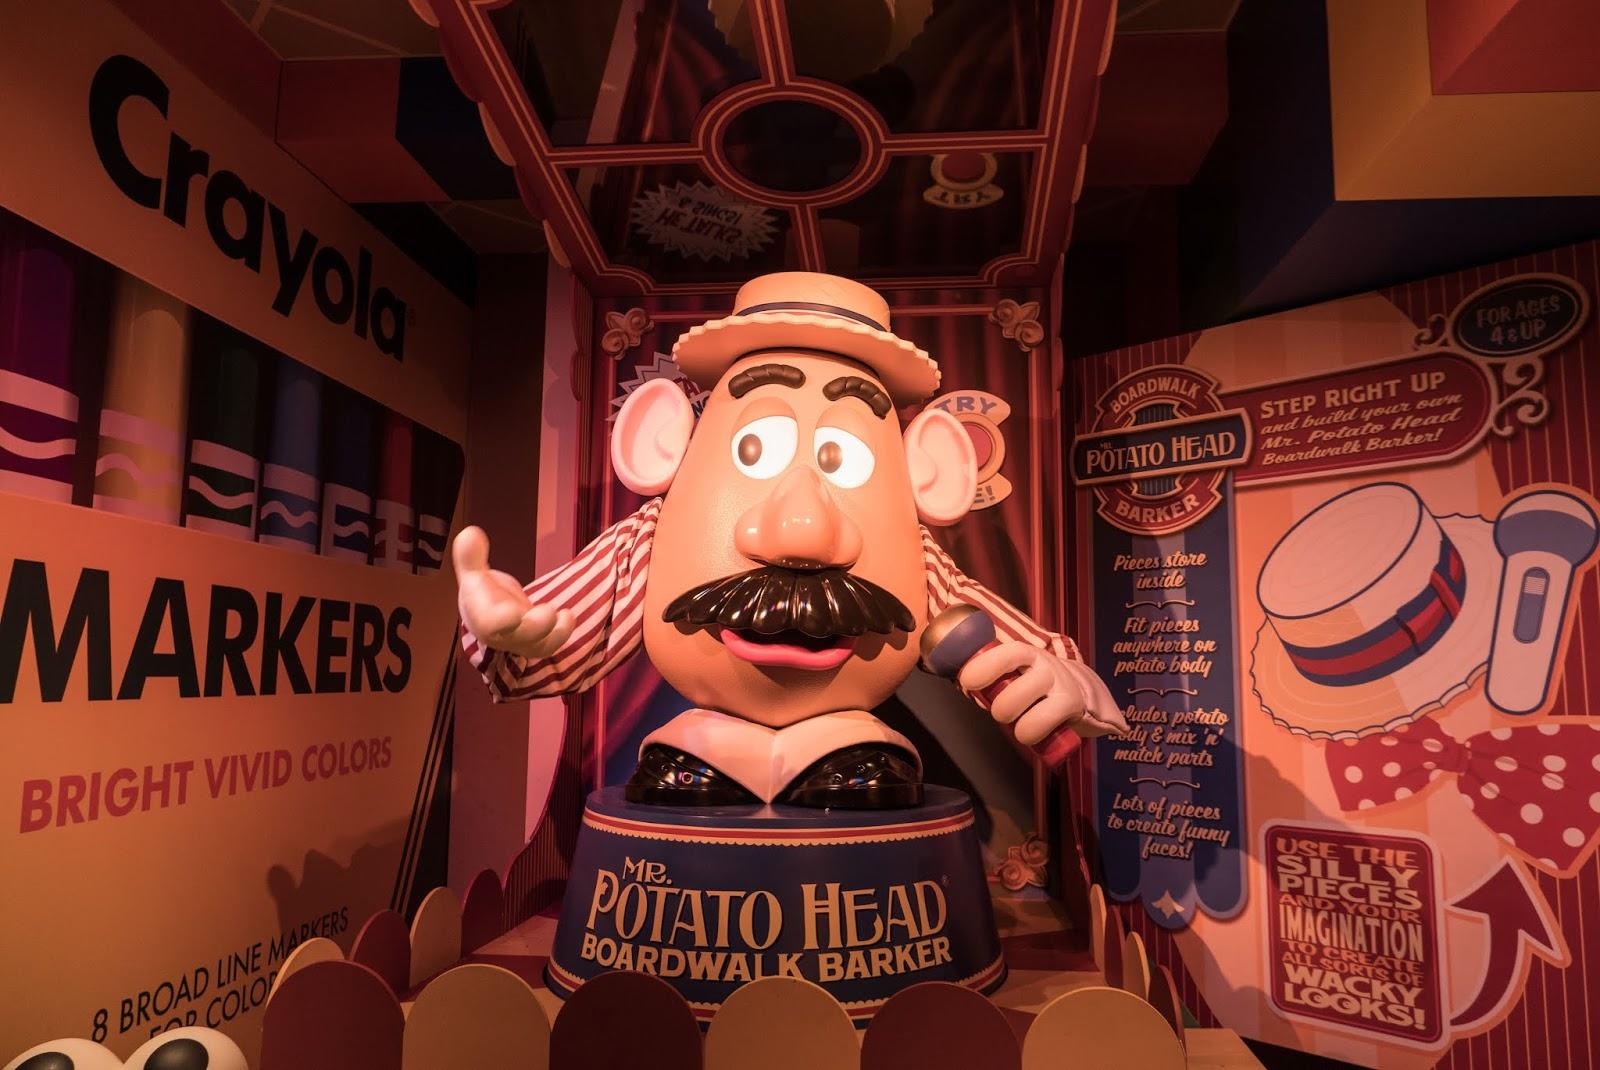 Toy Story Mania at Disney's Hollywood Studios, Walt Disney World